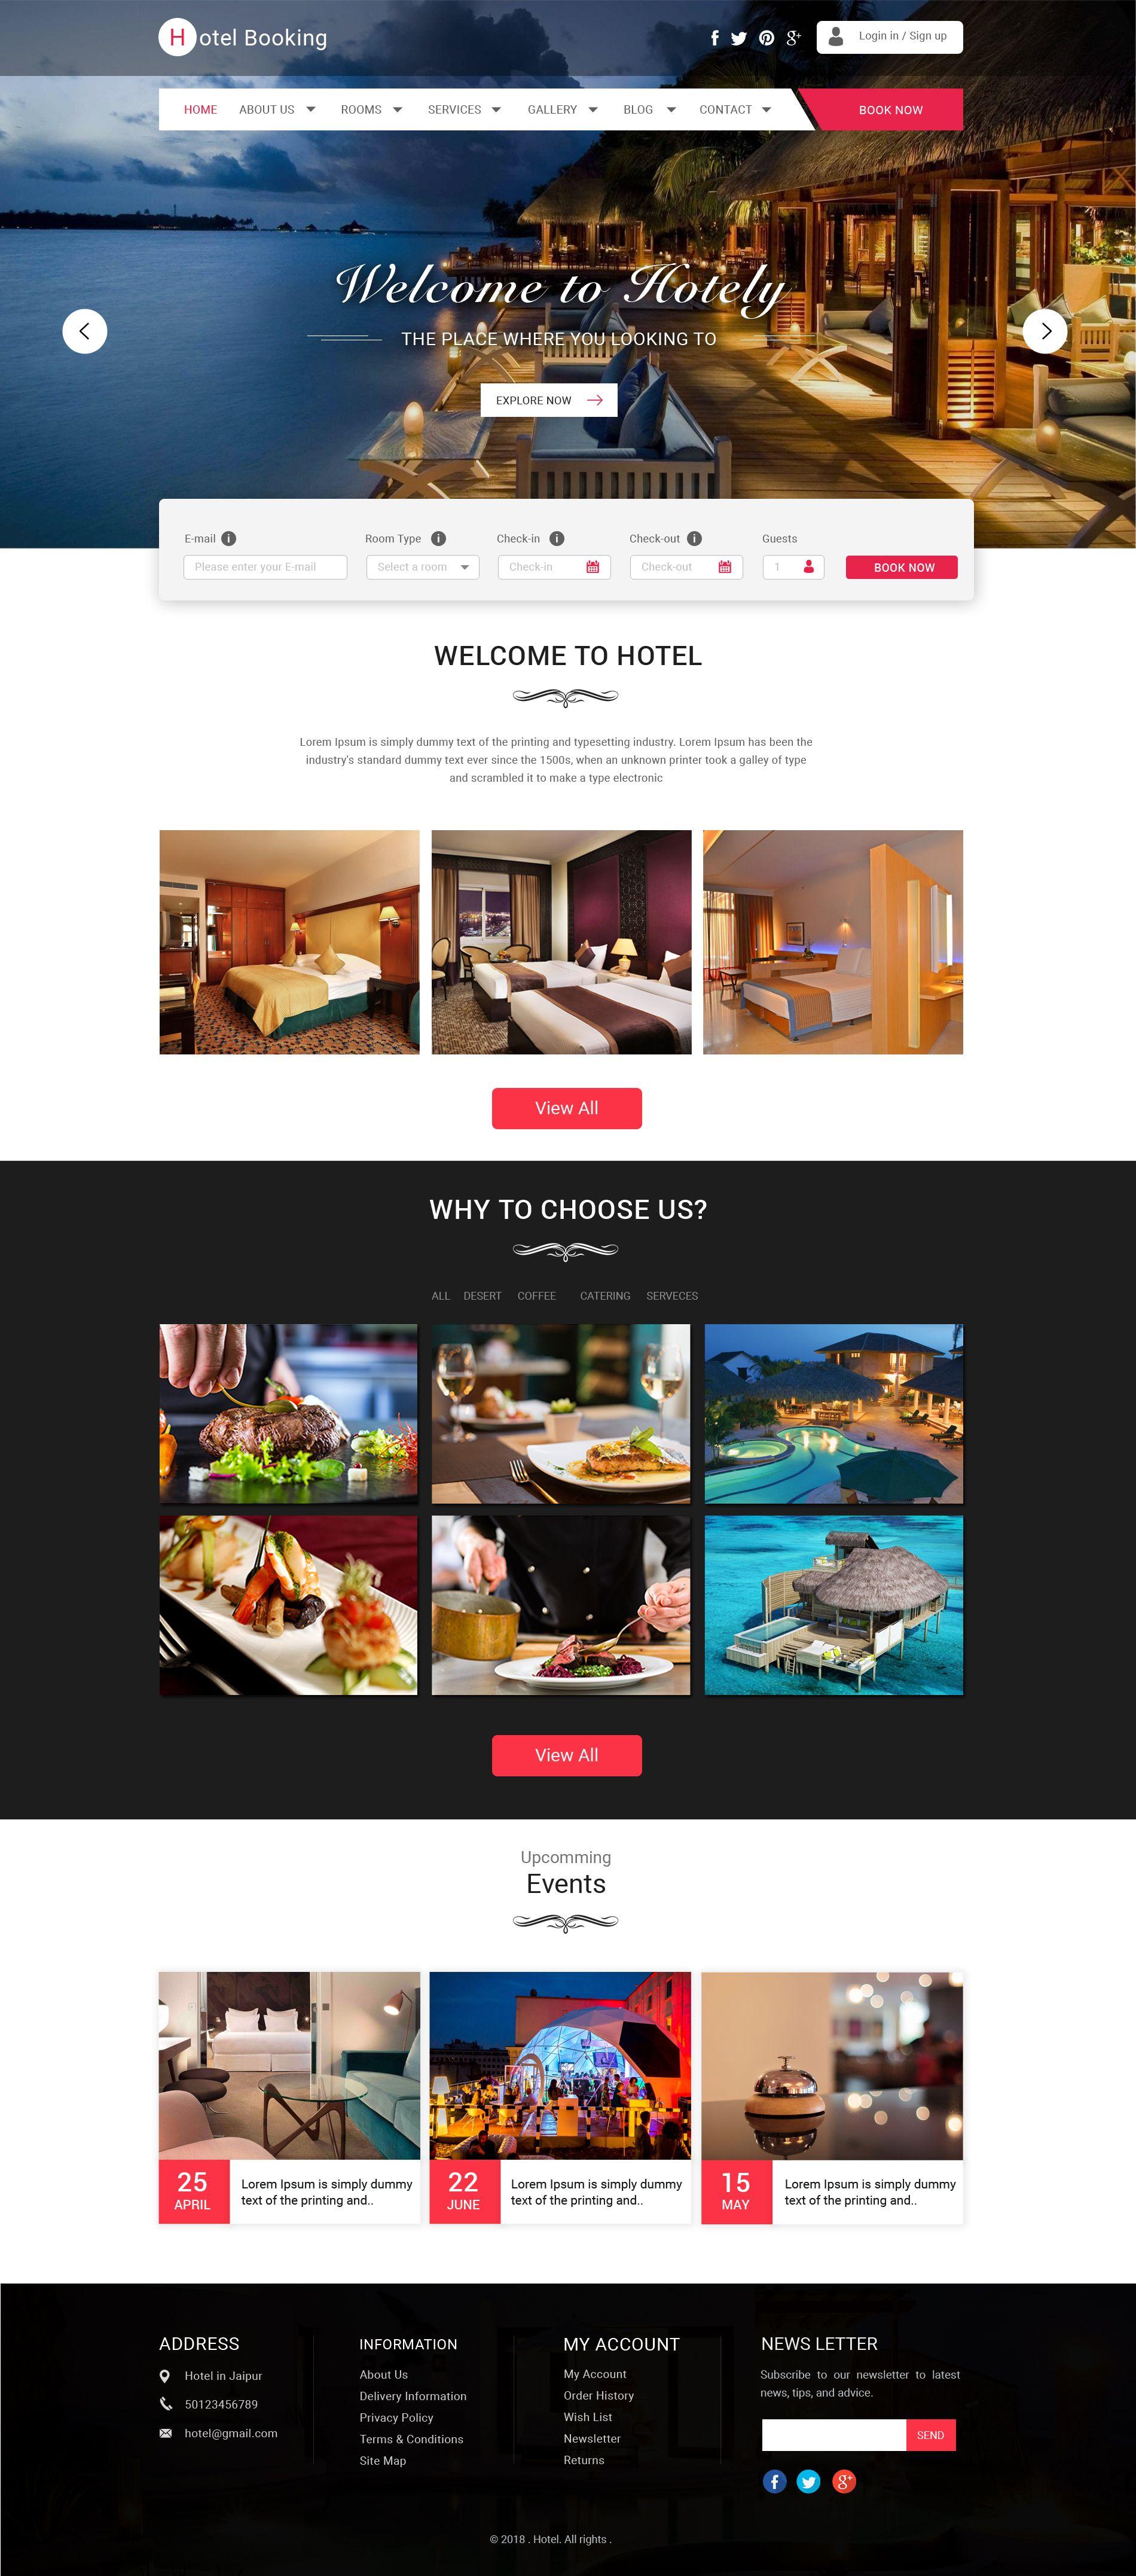 Hotel Reservation Websites Templates With Images Hotel Website